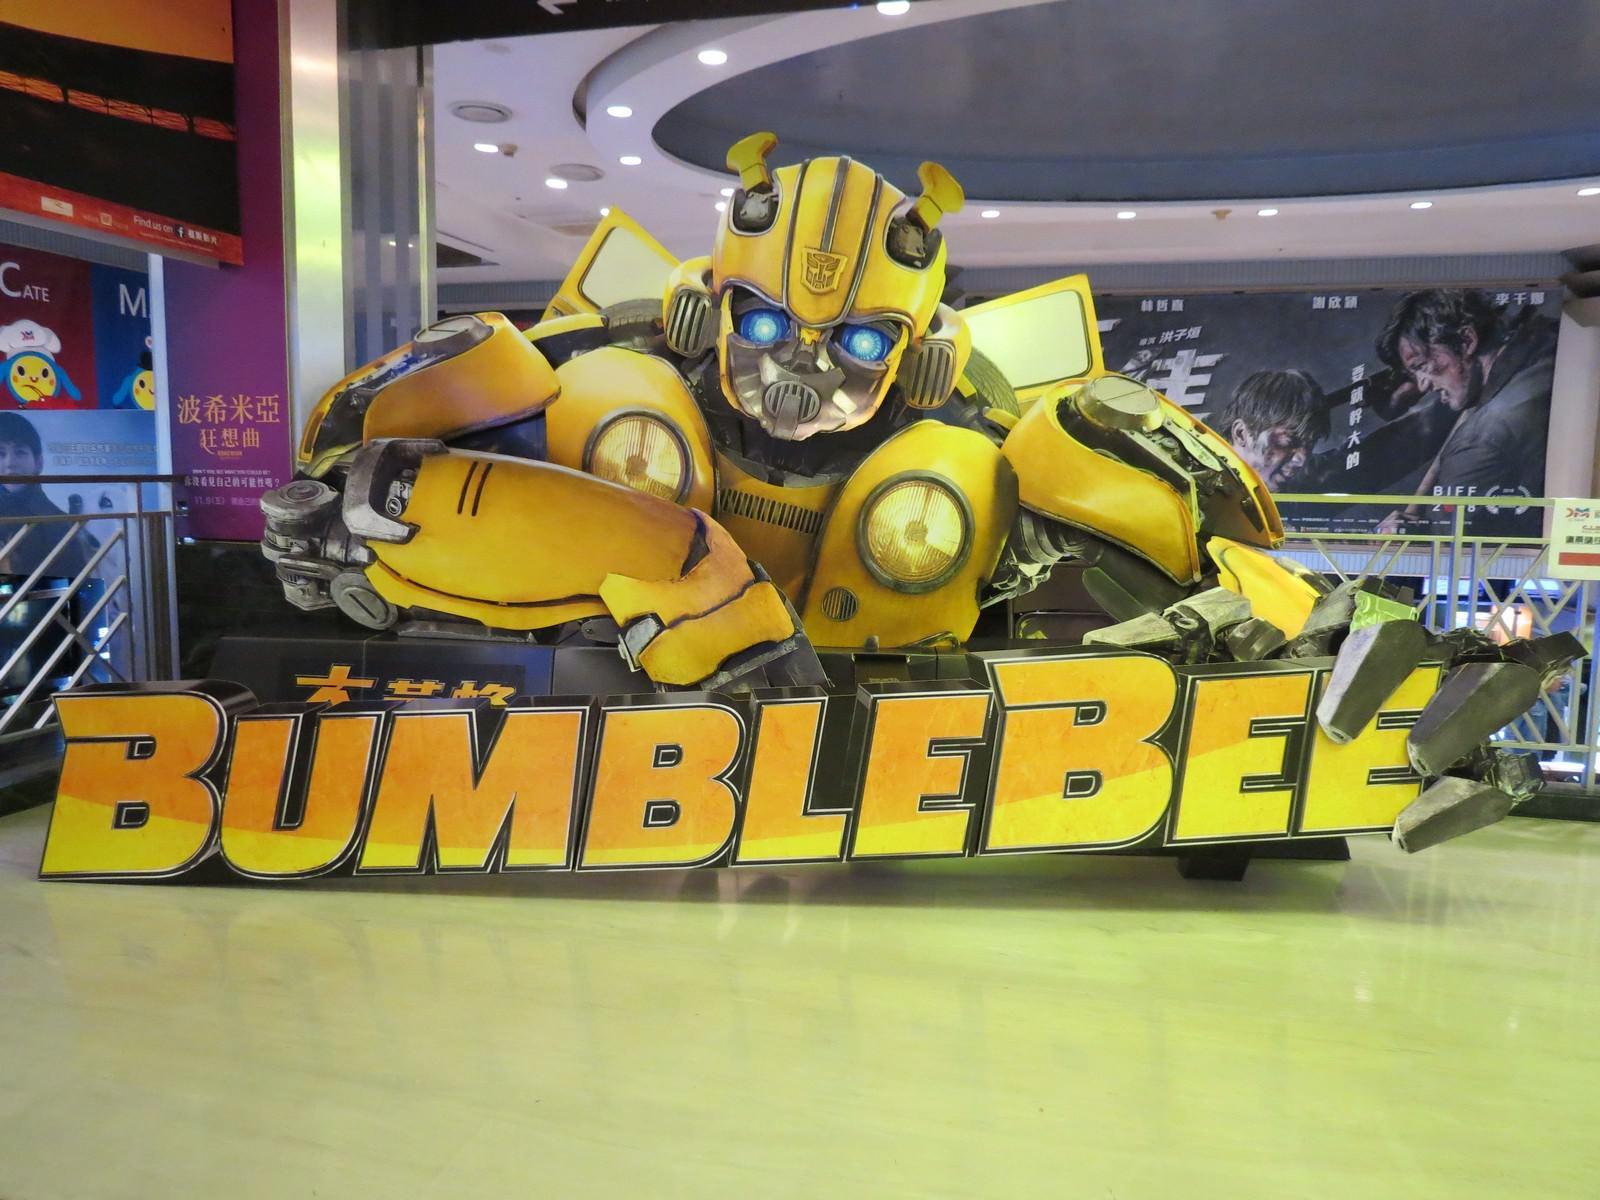 Movie, Bumblebee(美國, 2018年) / 大黃蜂(台灣.香港) / 大黄蜂(中國), 廣告看板, 喜滿客京華影城